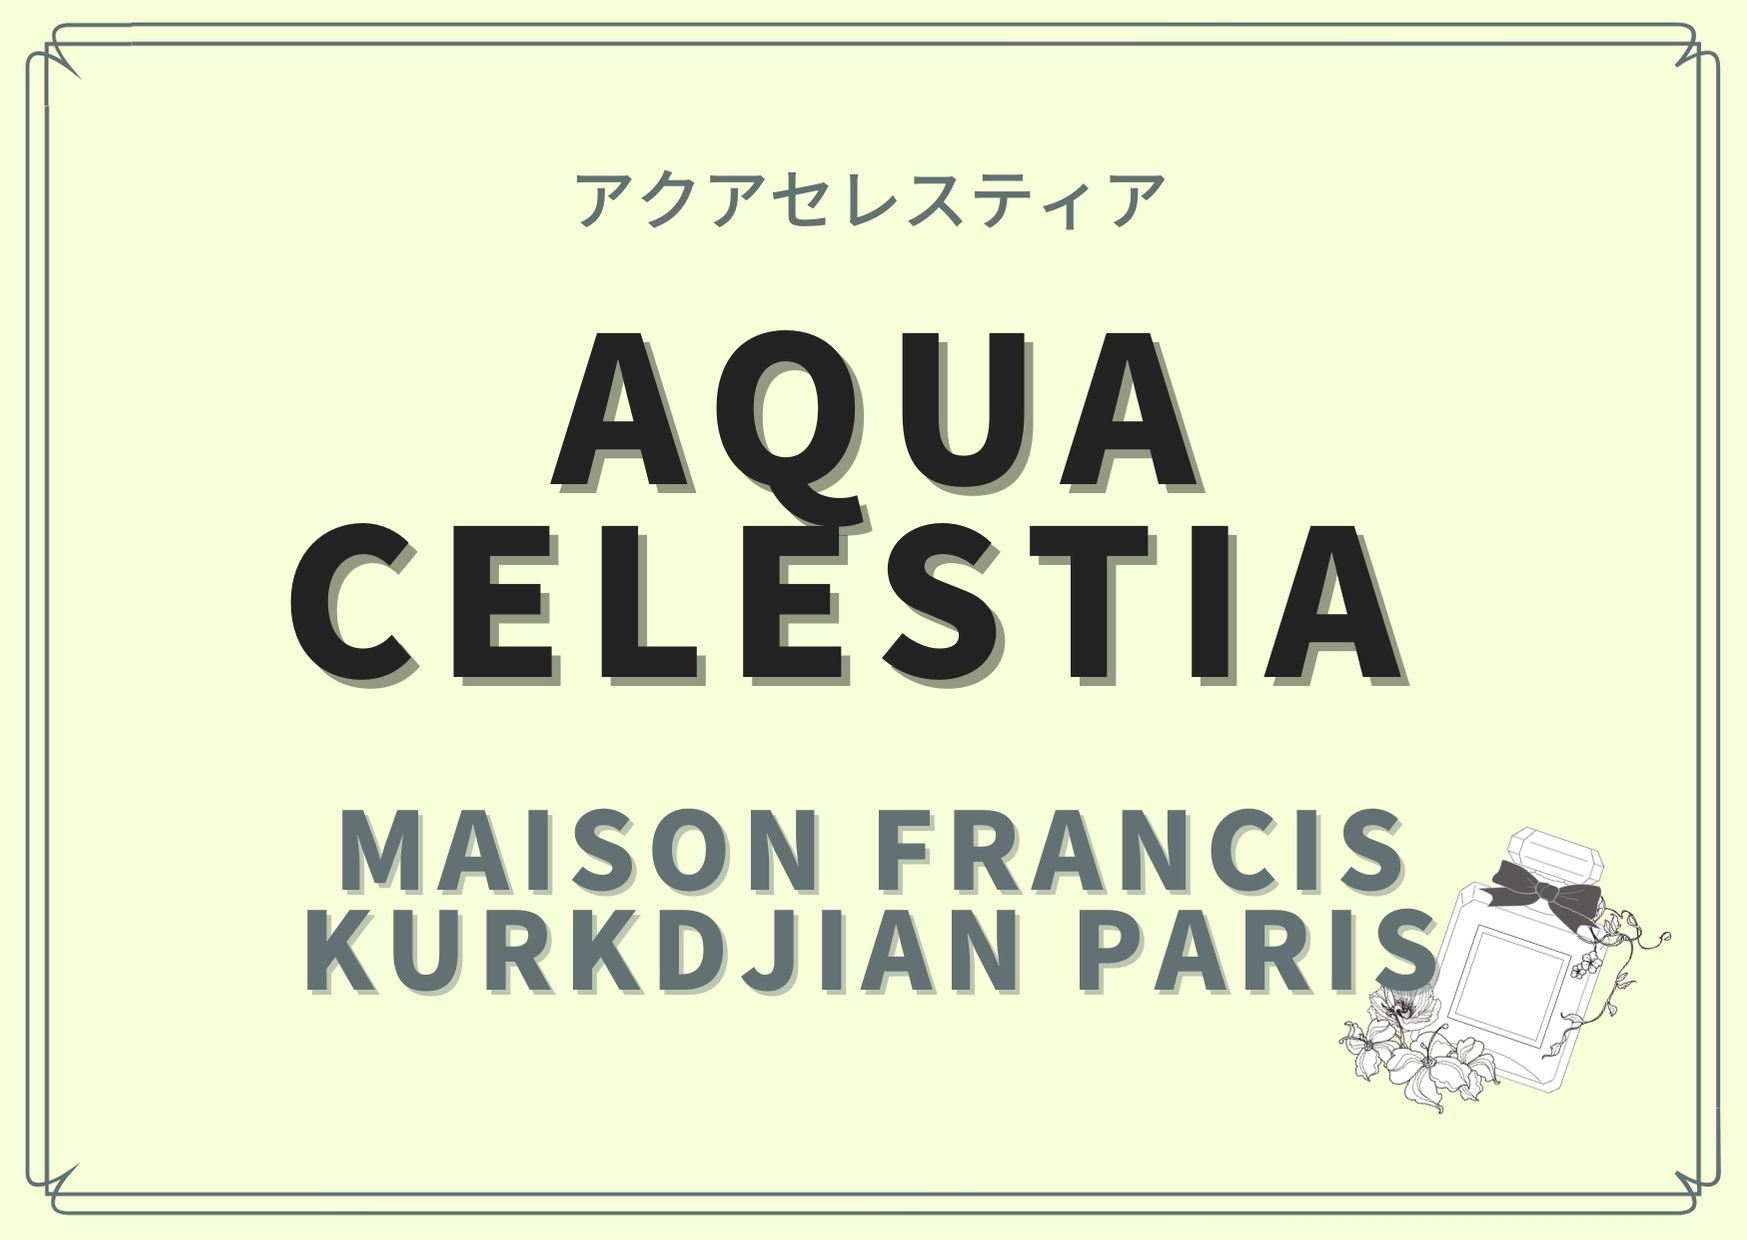 AQUA CELESTIA(アクアセレスティア) / Maison Francis Kurkdjian Paris(メゾン フランシス クルジャン)